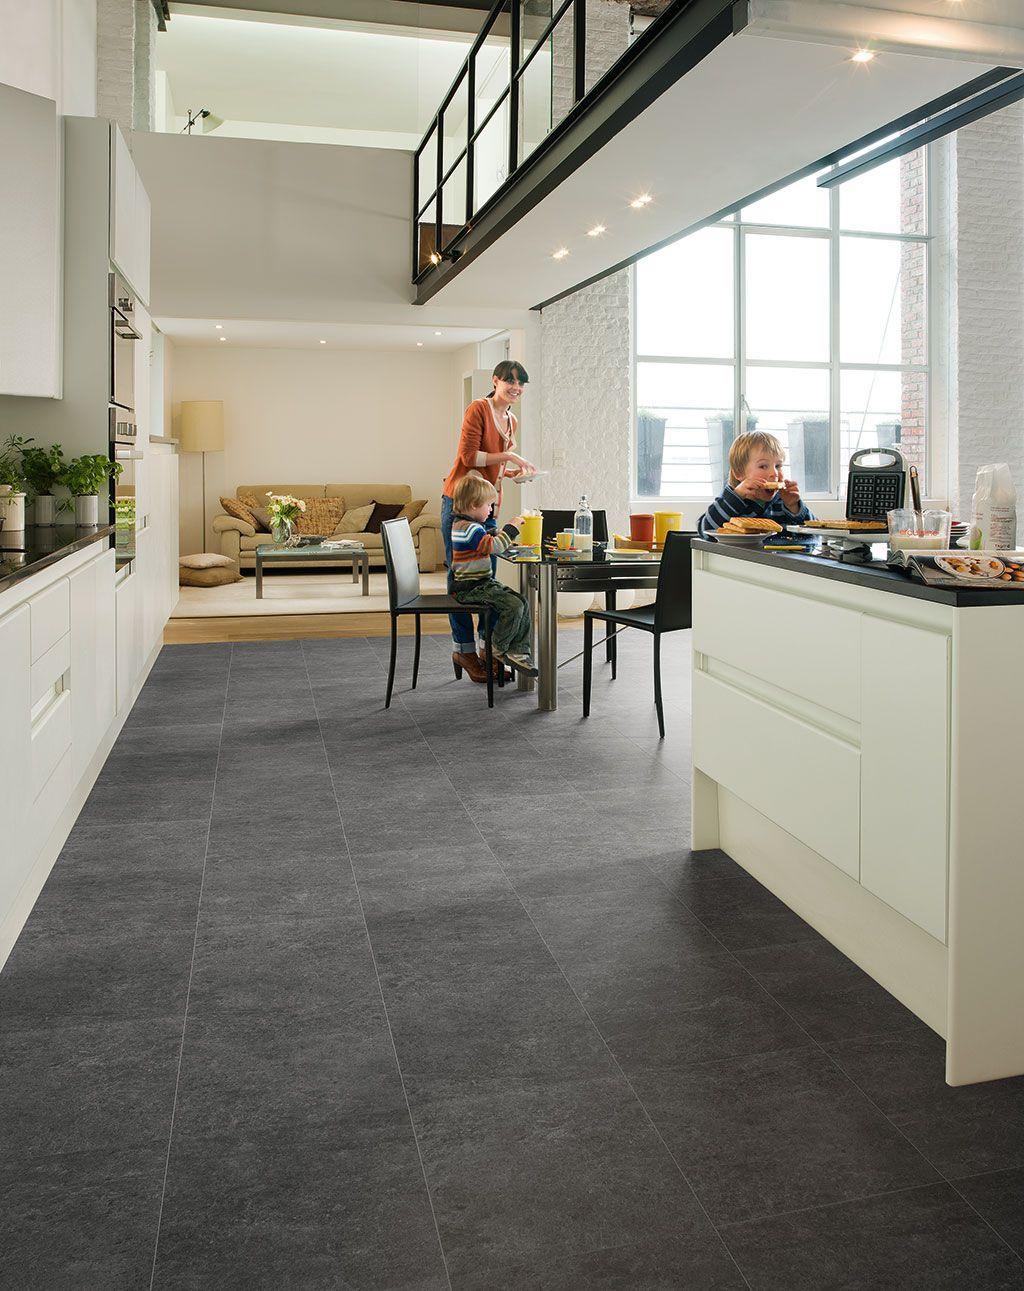 Kitchen Waterproof Laminate Flooring Lowes Shaw Brands To Avoid Installing